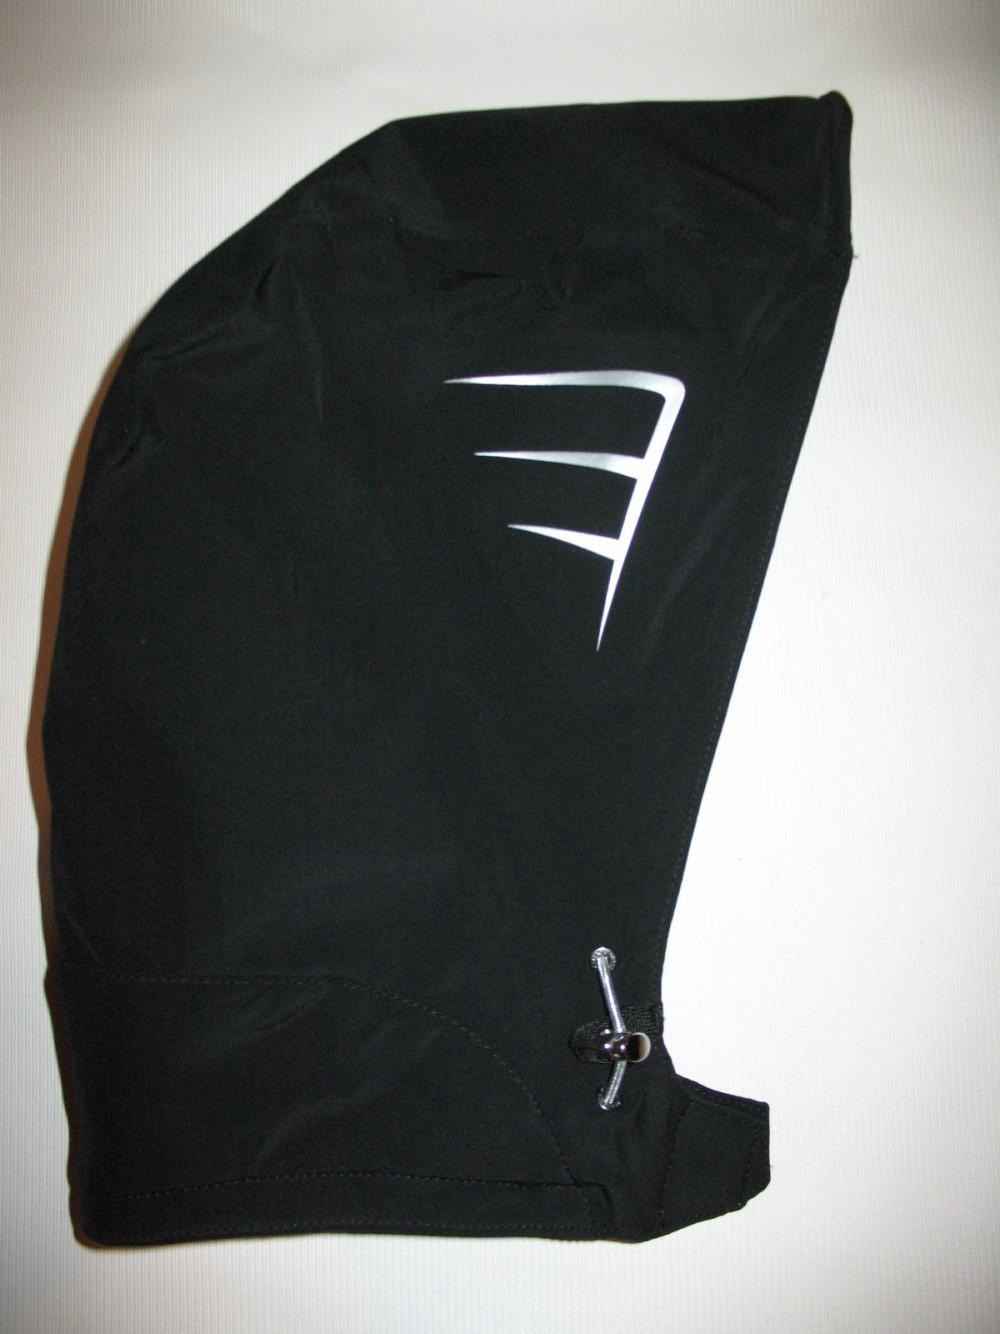 Куртка DESCENTE swiss olympic ski jacket (размер 54/XL) - 12